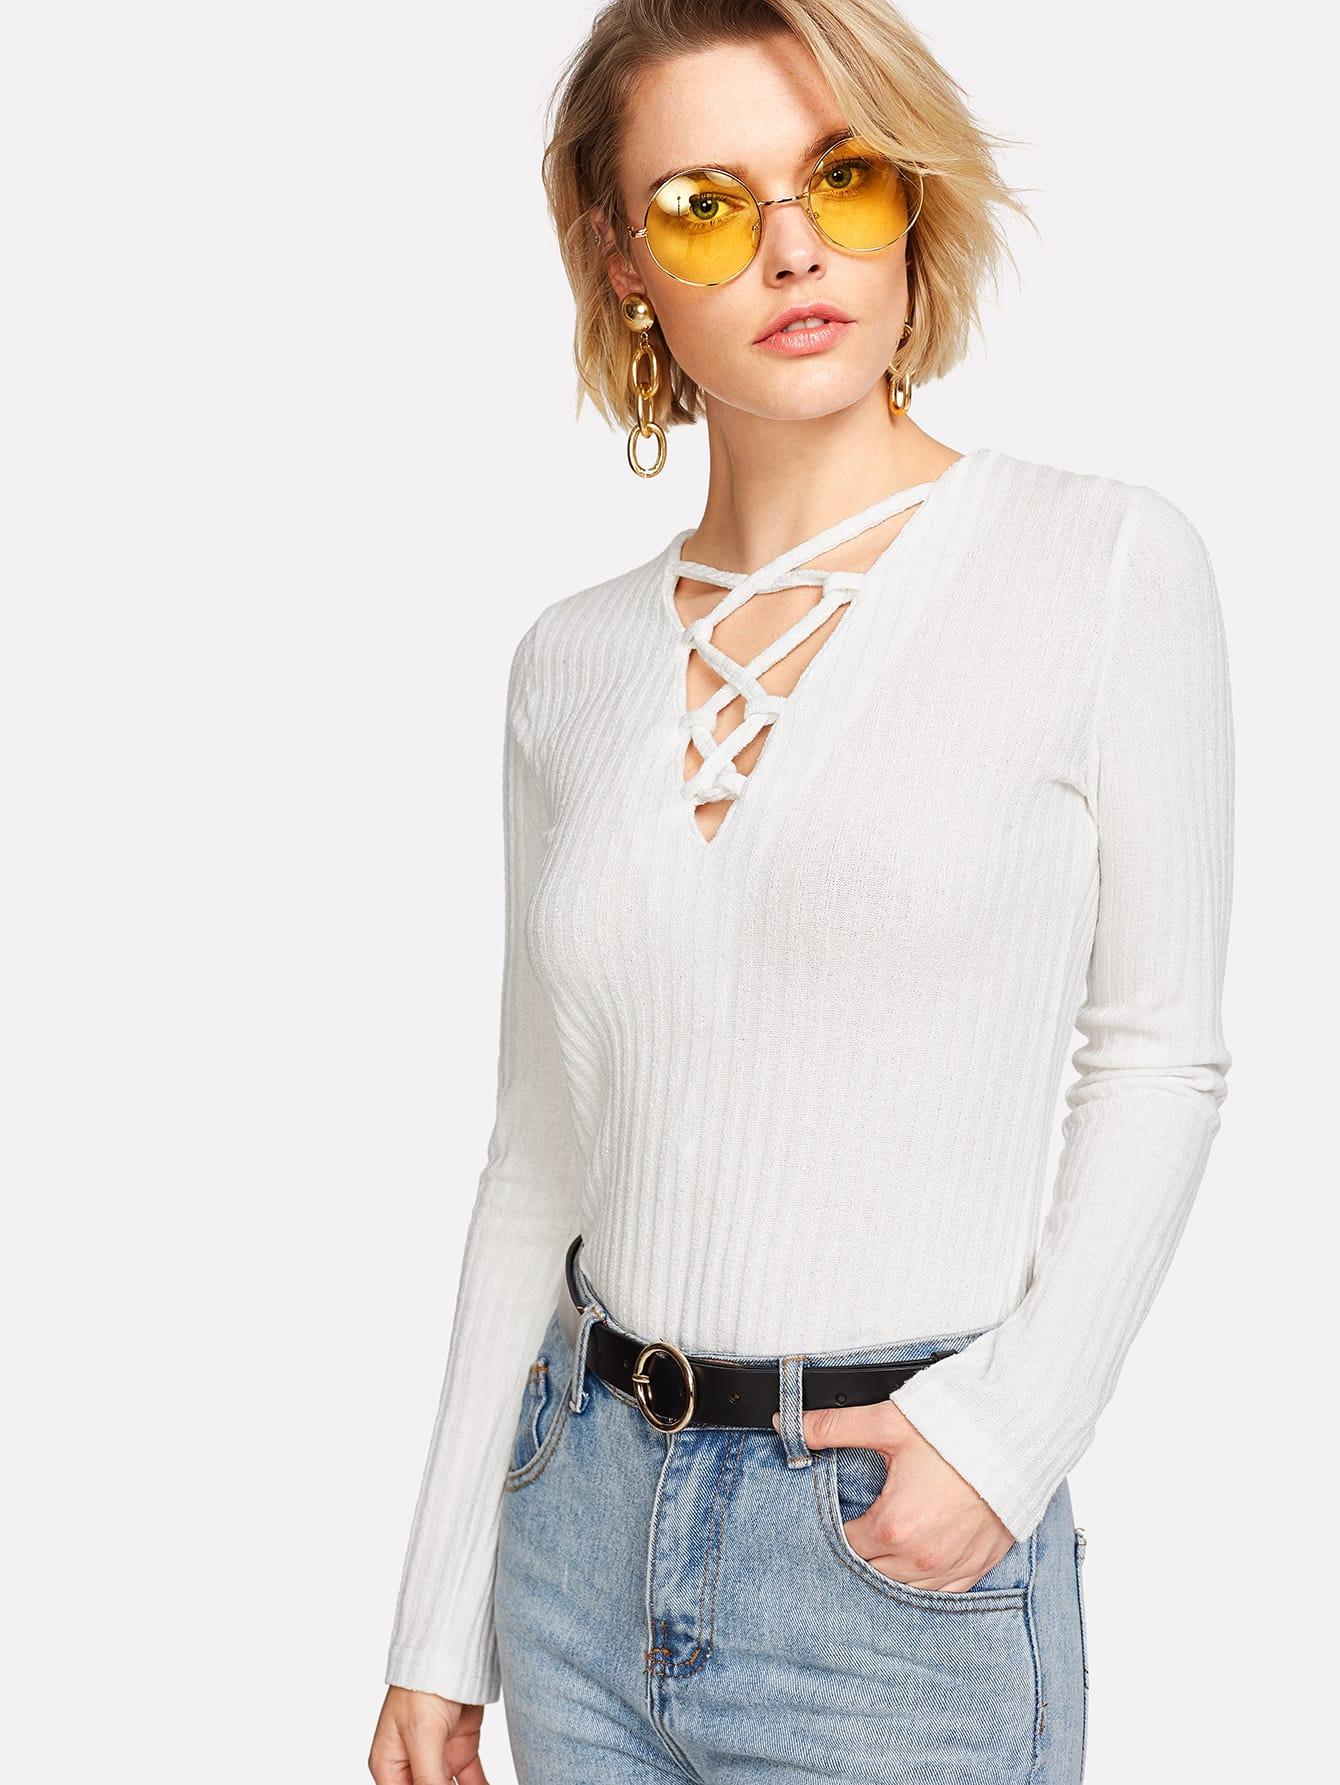 Criss Cross Detail Knit Tee pearls beaded detail knit tee